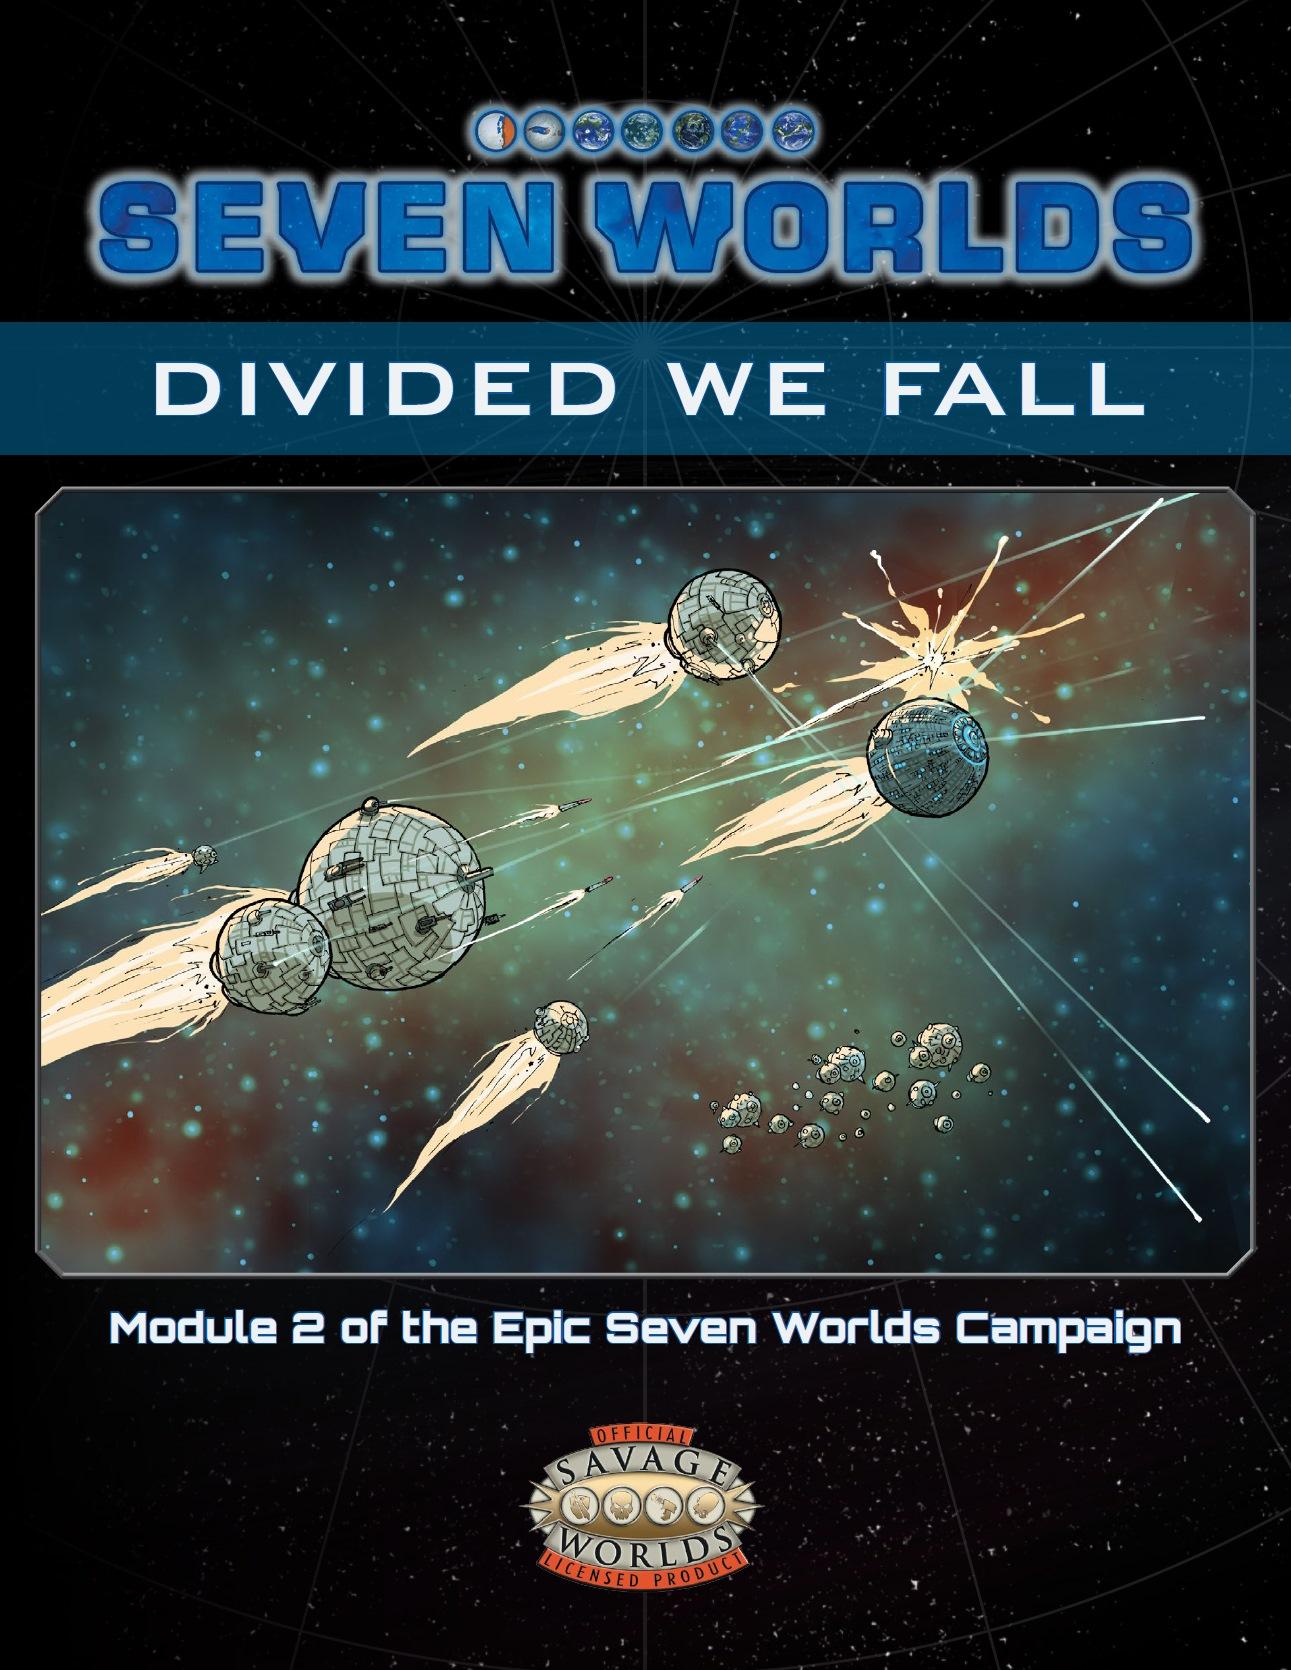 Module 2- Divided We Fall